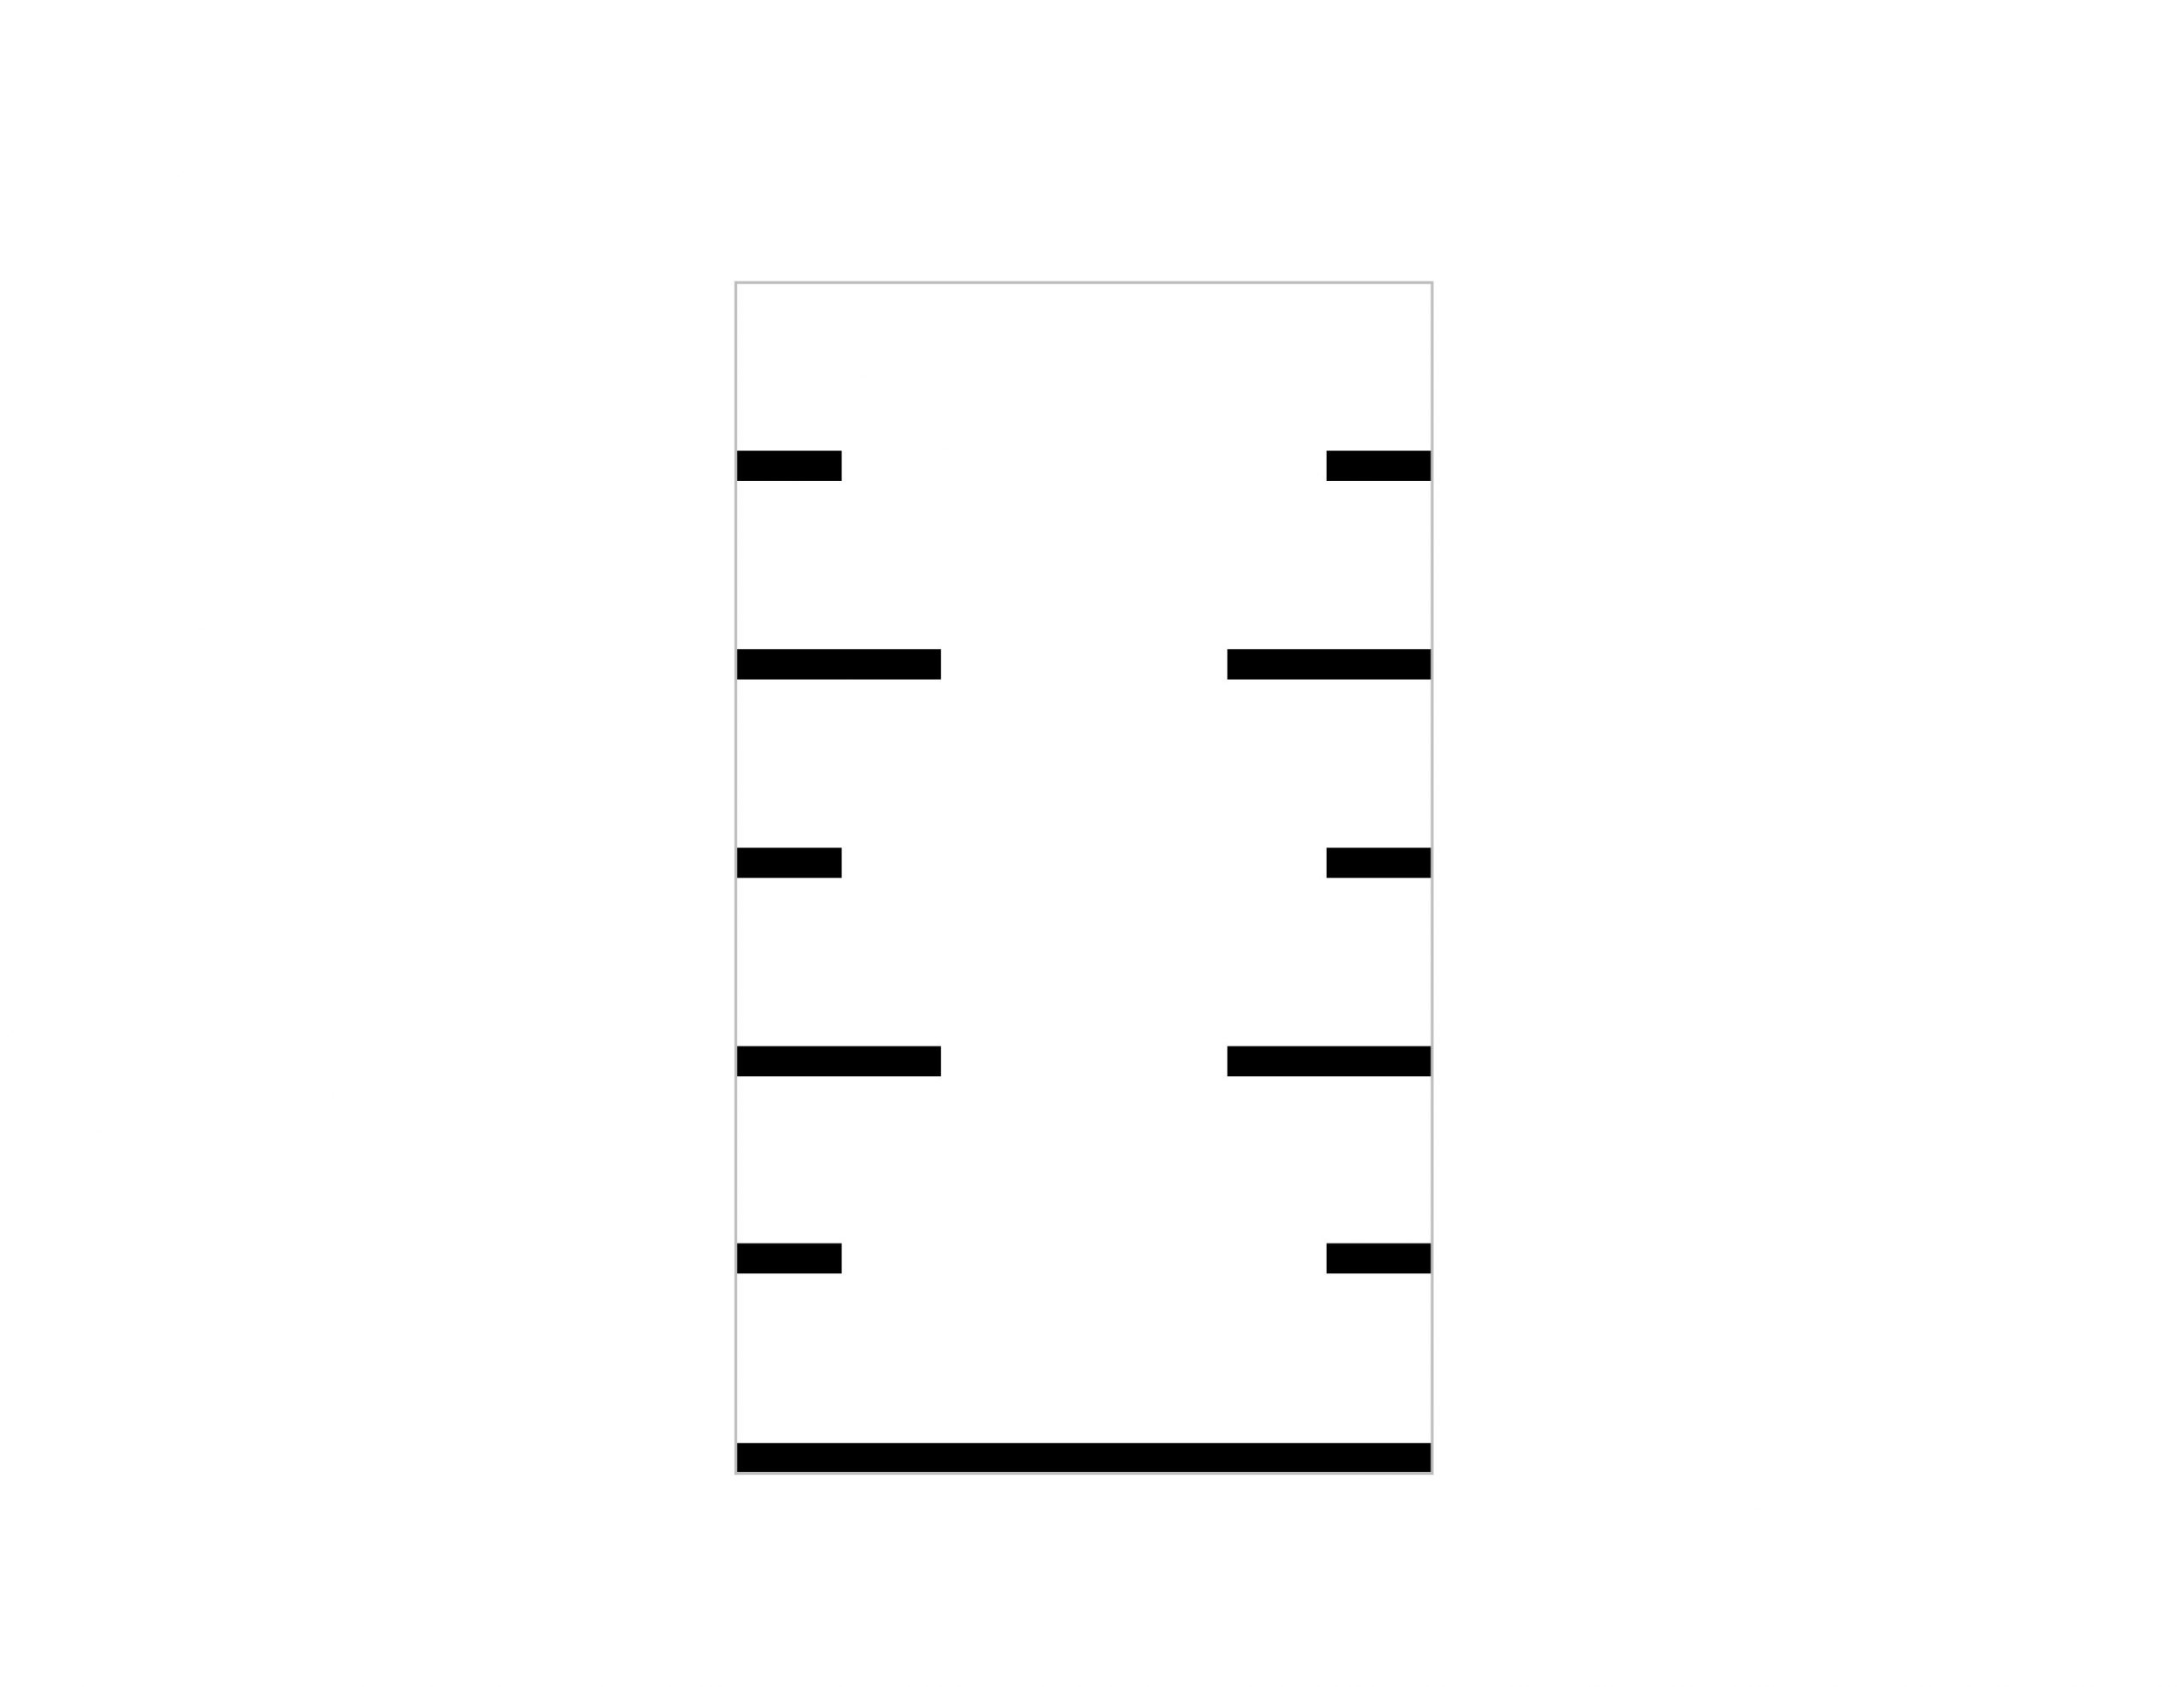 Easy Diy Ruler Growth Chart | Growth Chart Ruler, Chart